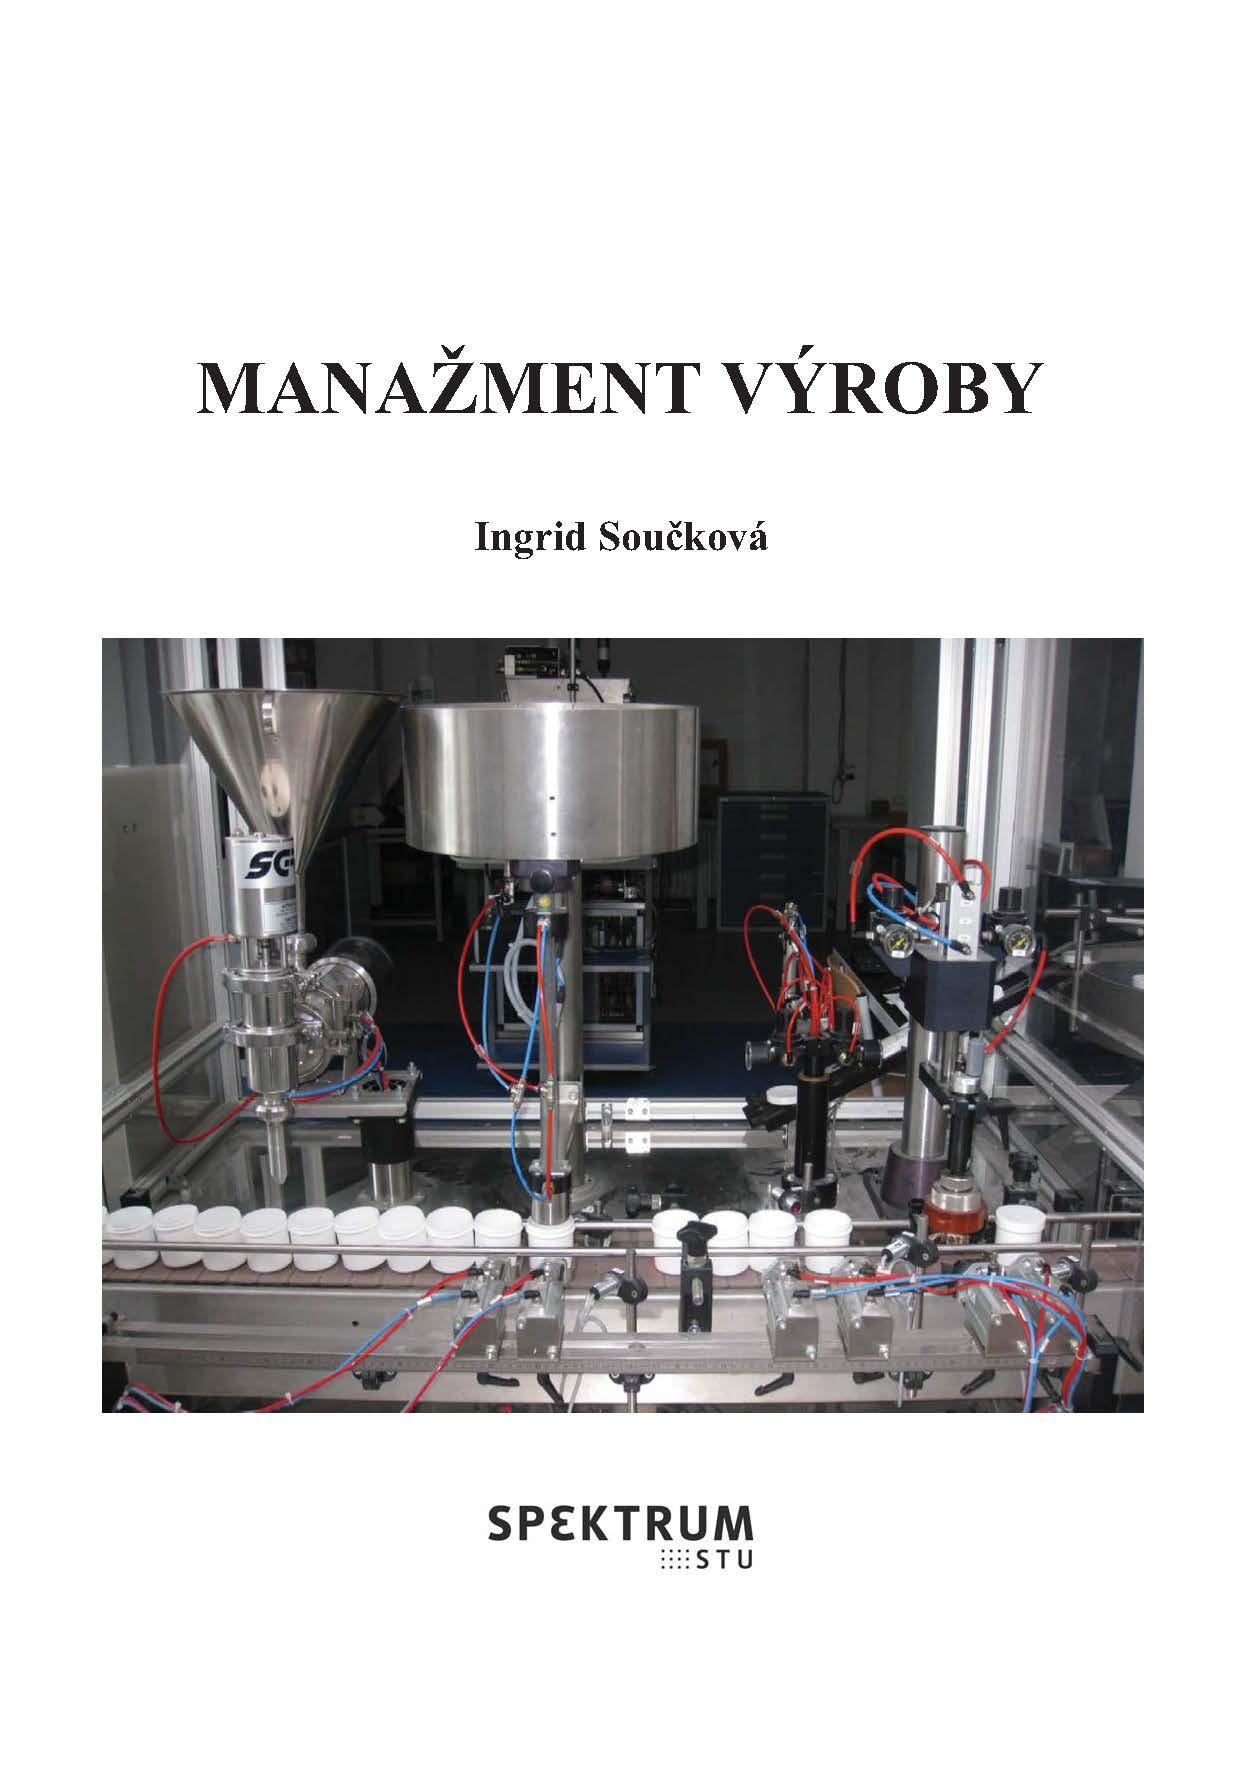 Manažment výroby